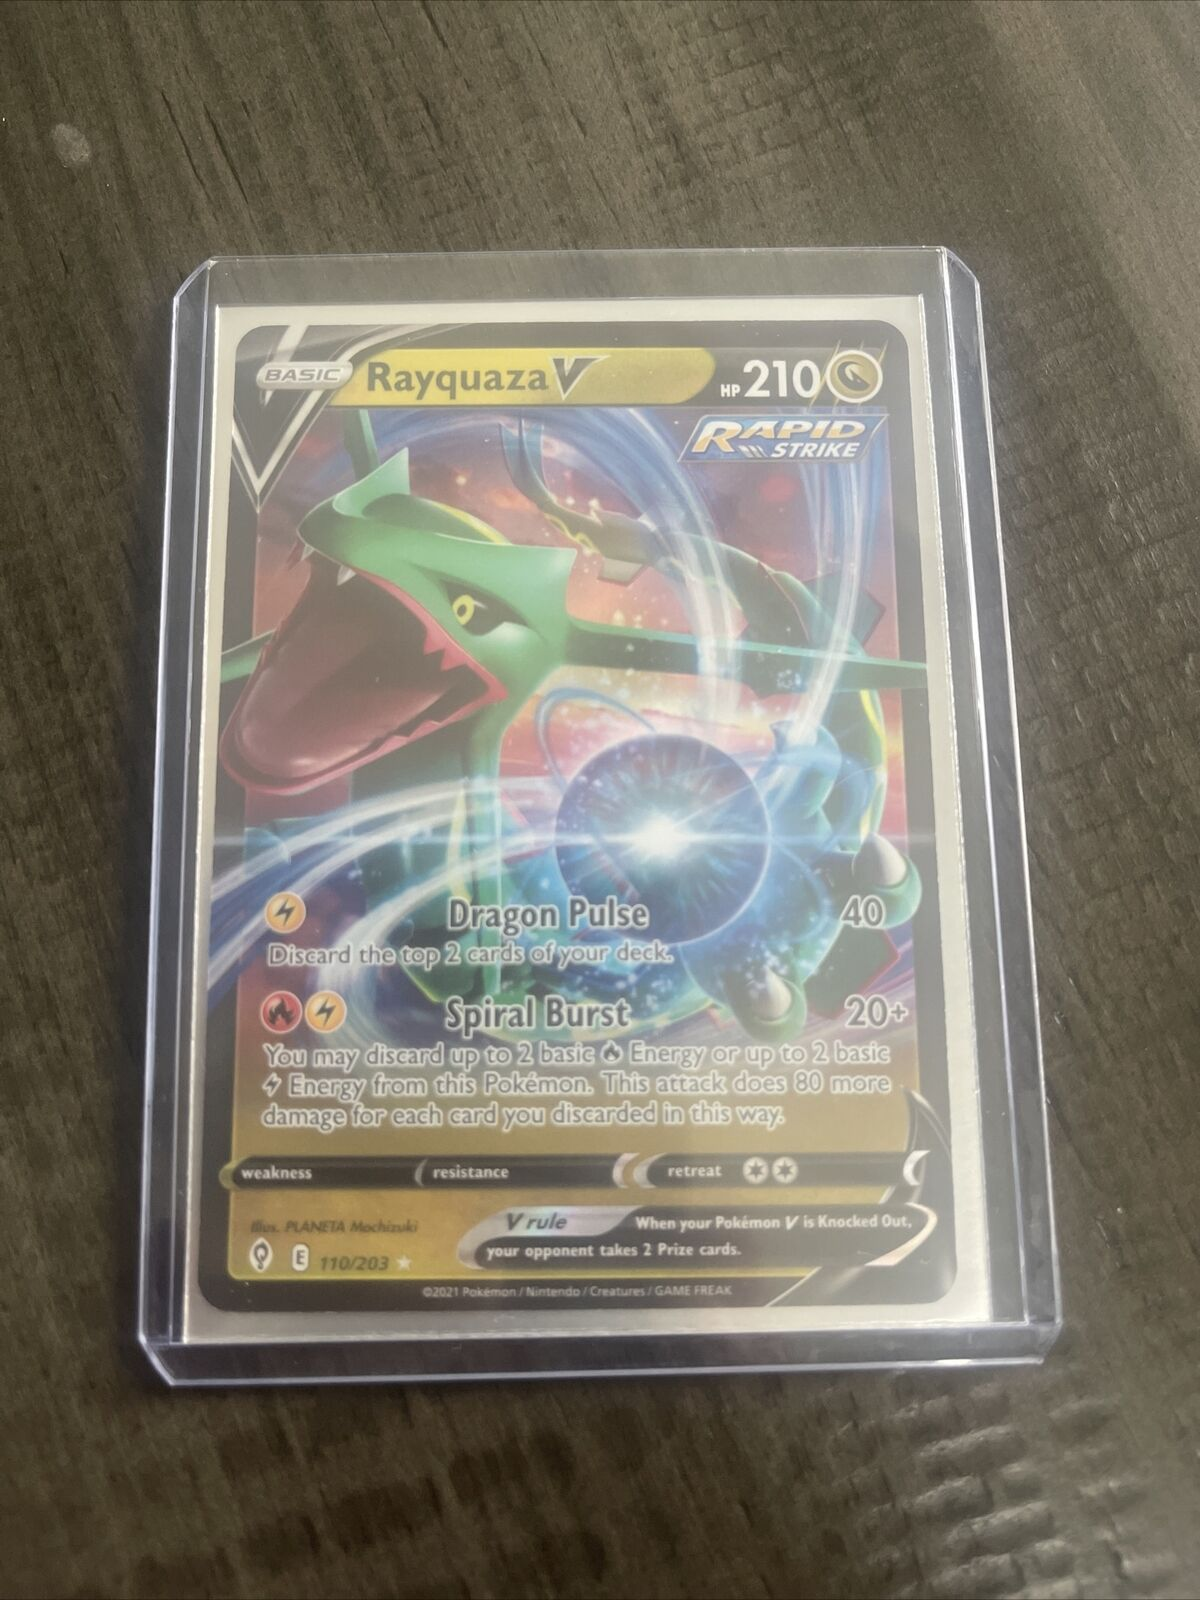 Rayquaza V 110/203 Pokemon TCG Evolving Skies Full Art Ultra Rare LP/NM - Image 1